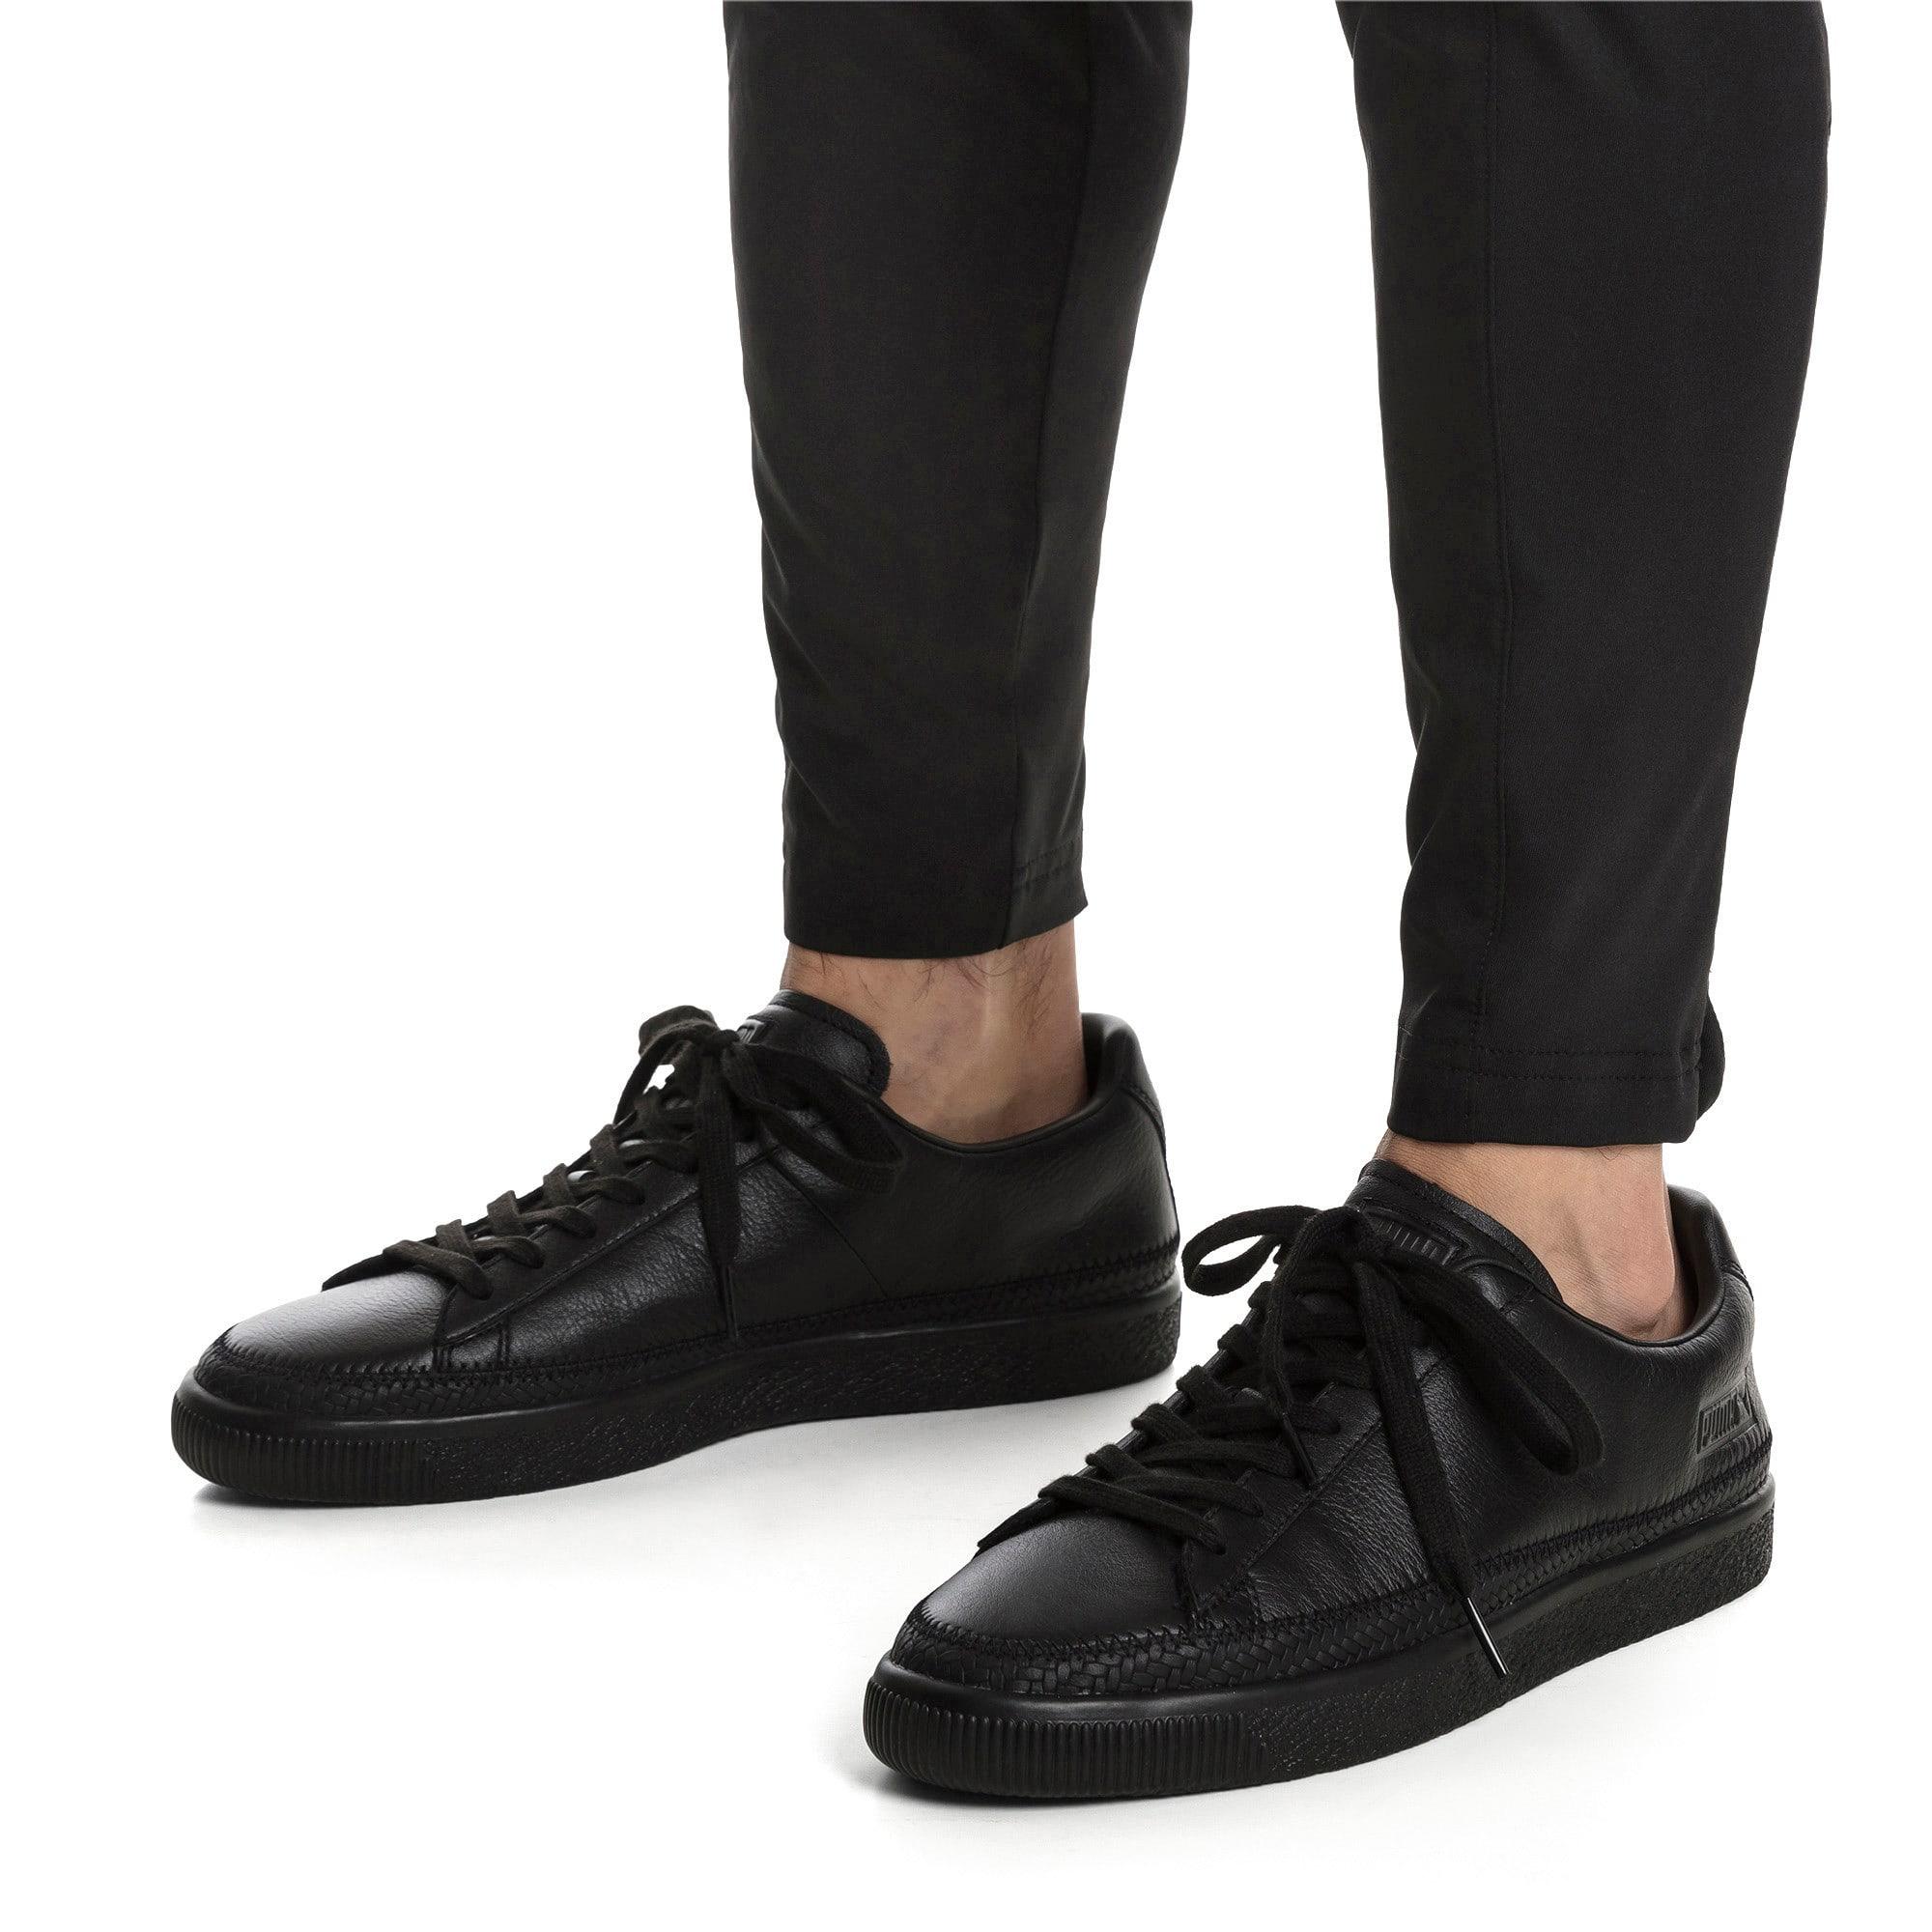 Basket Trim Schuhe